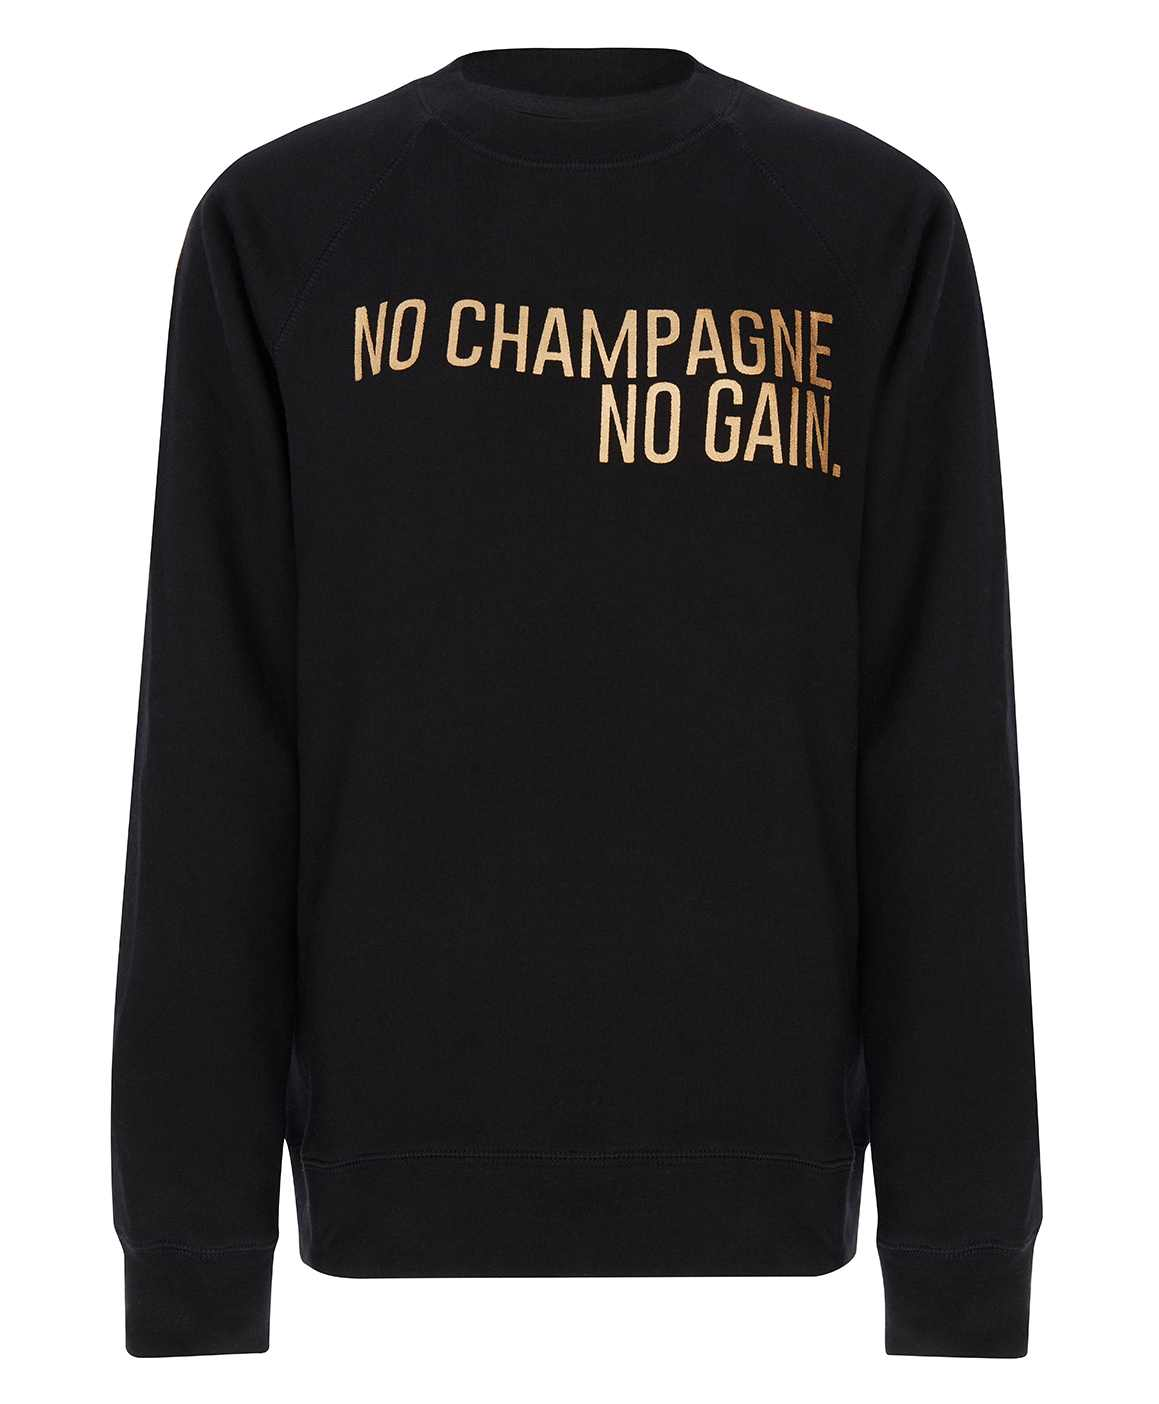 Brunette the Label No Champagne, No Gain Sweatshirt